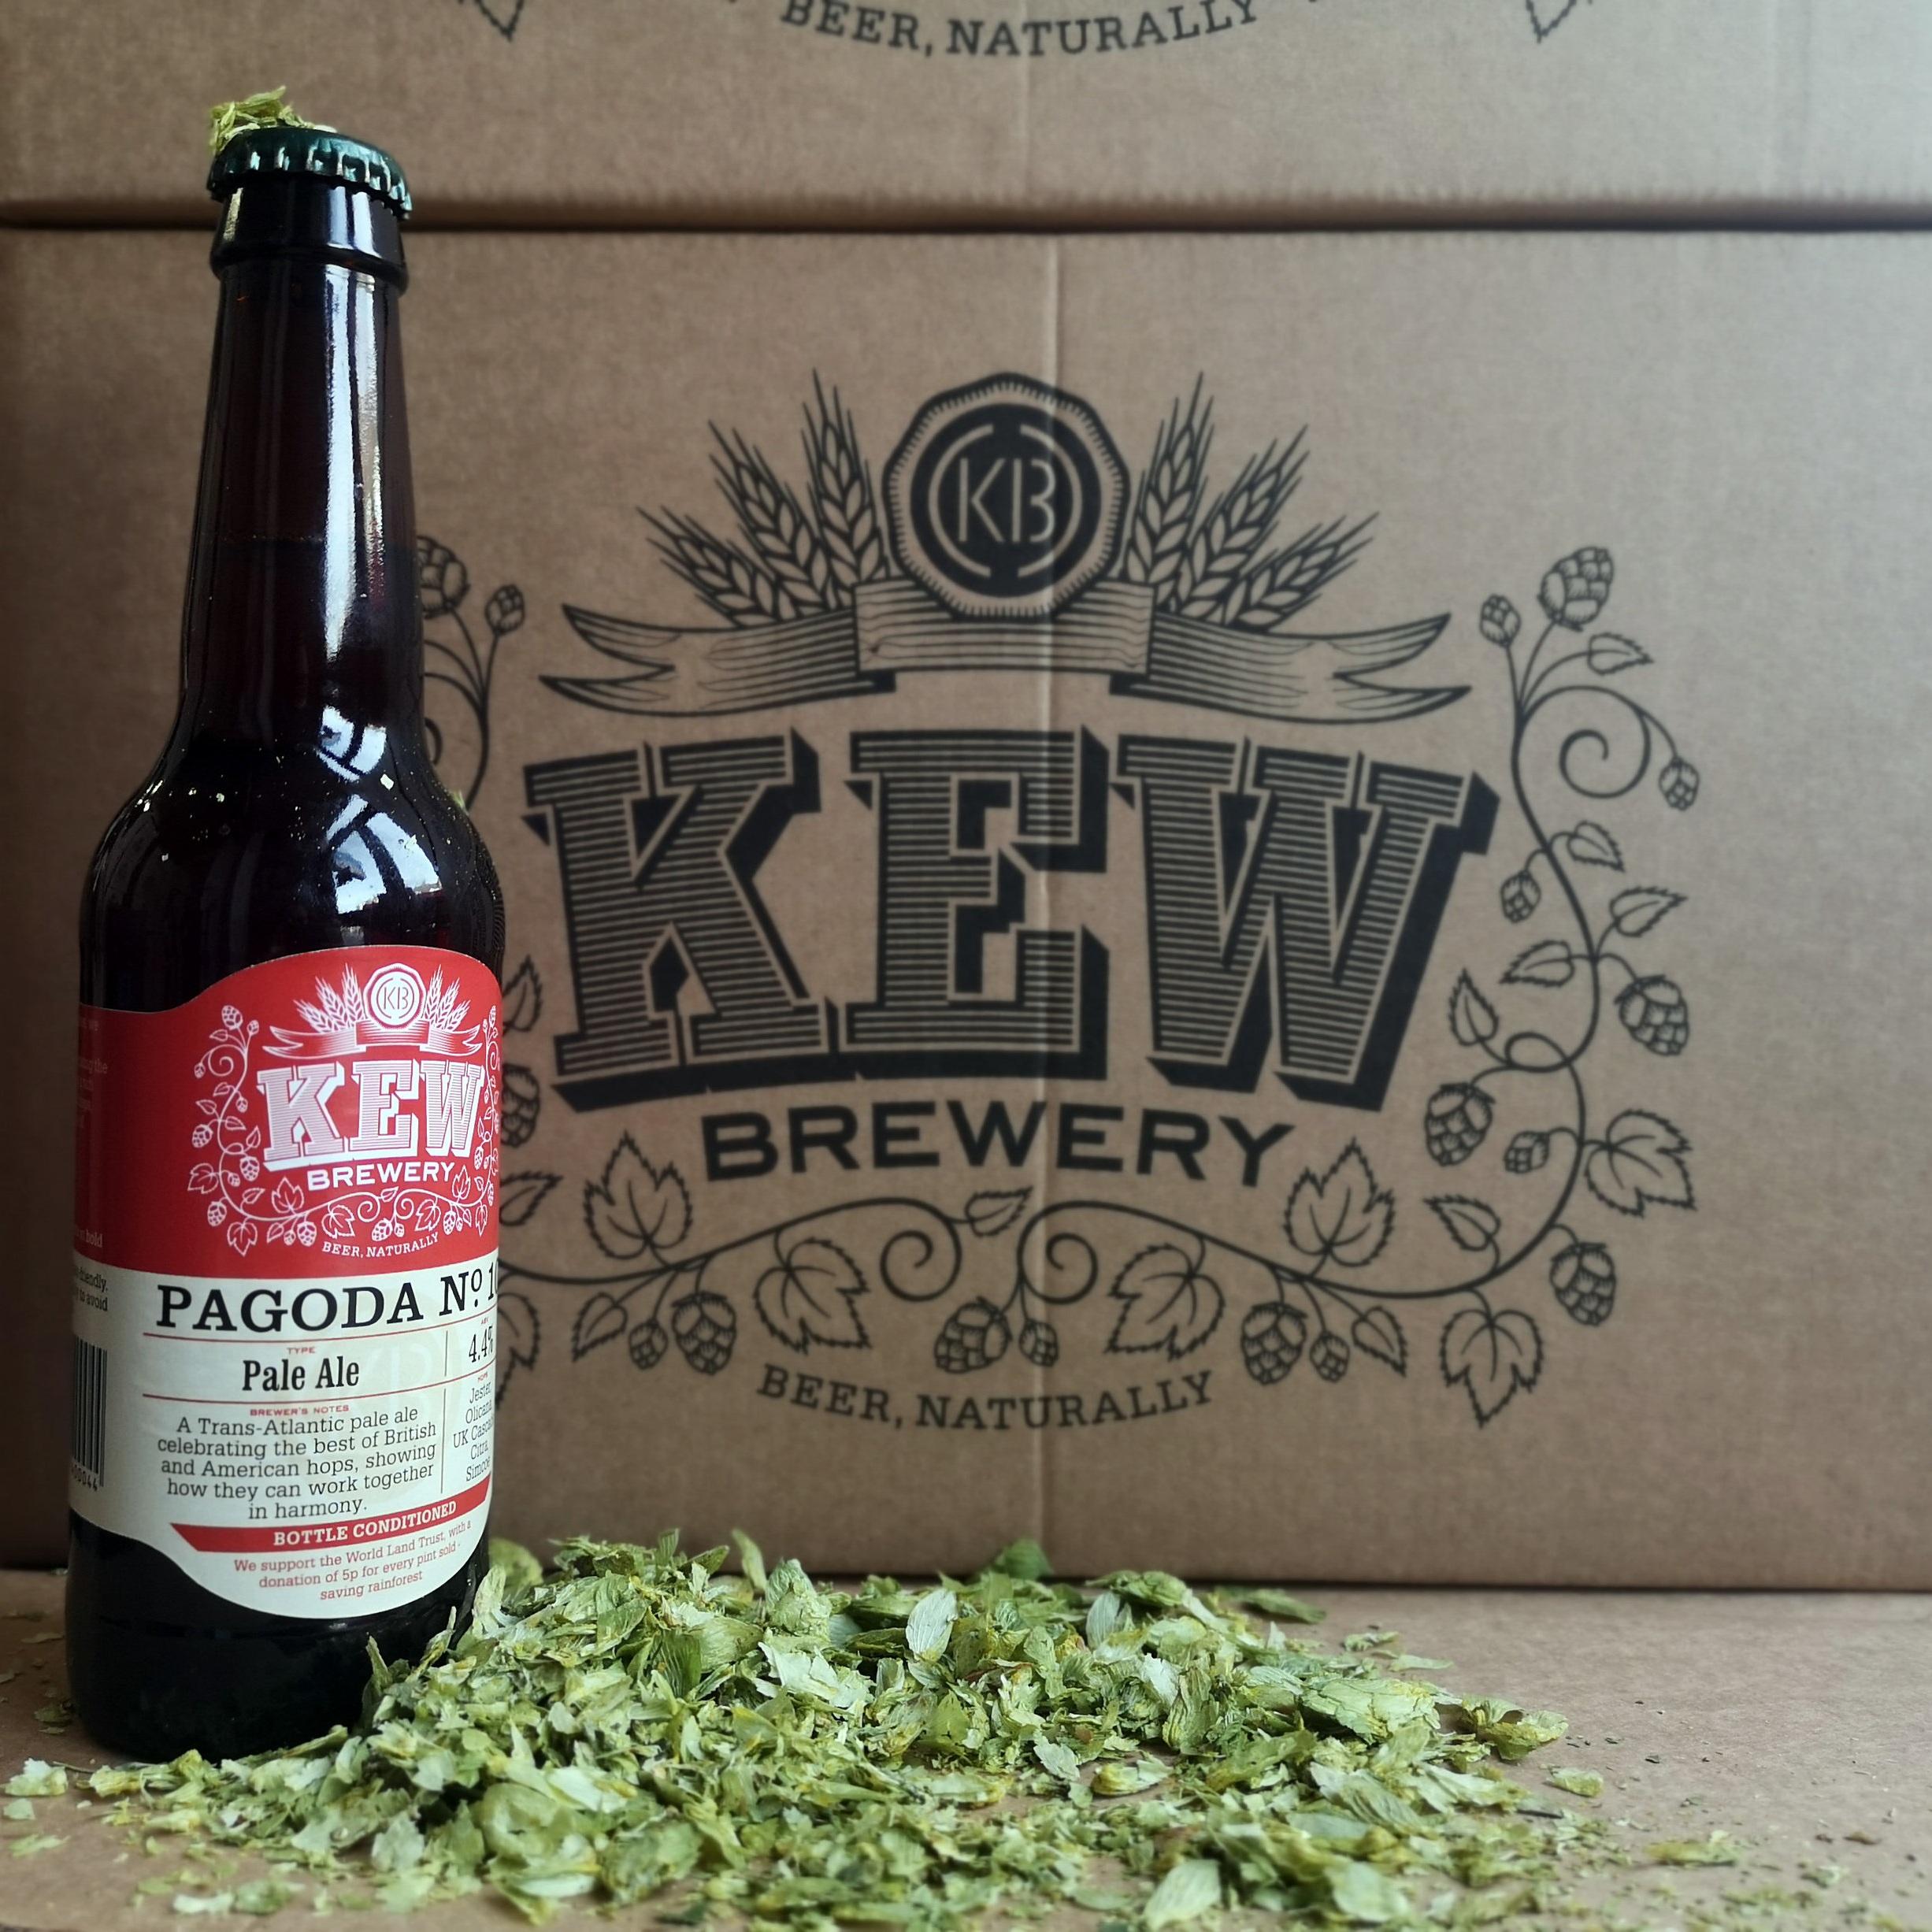 kew-brewery-pagoda-pale-ale